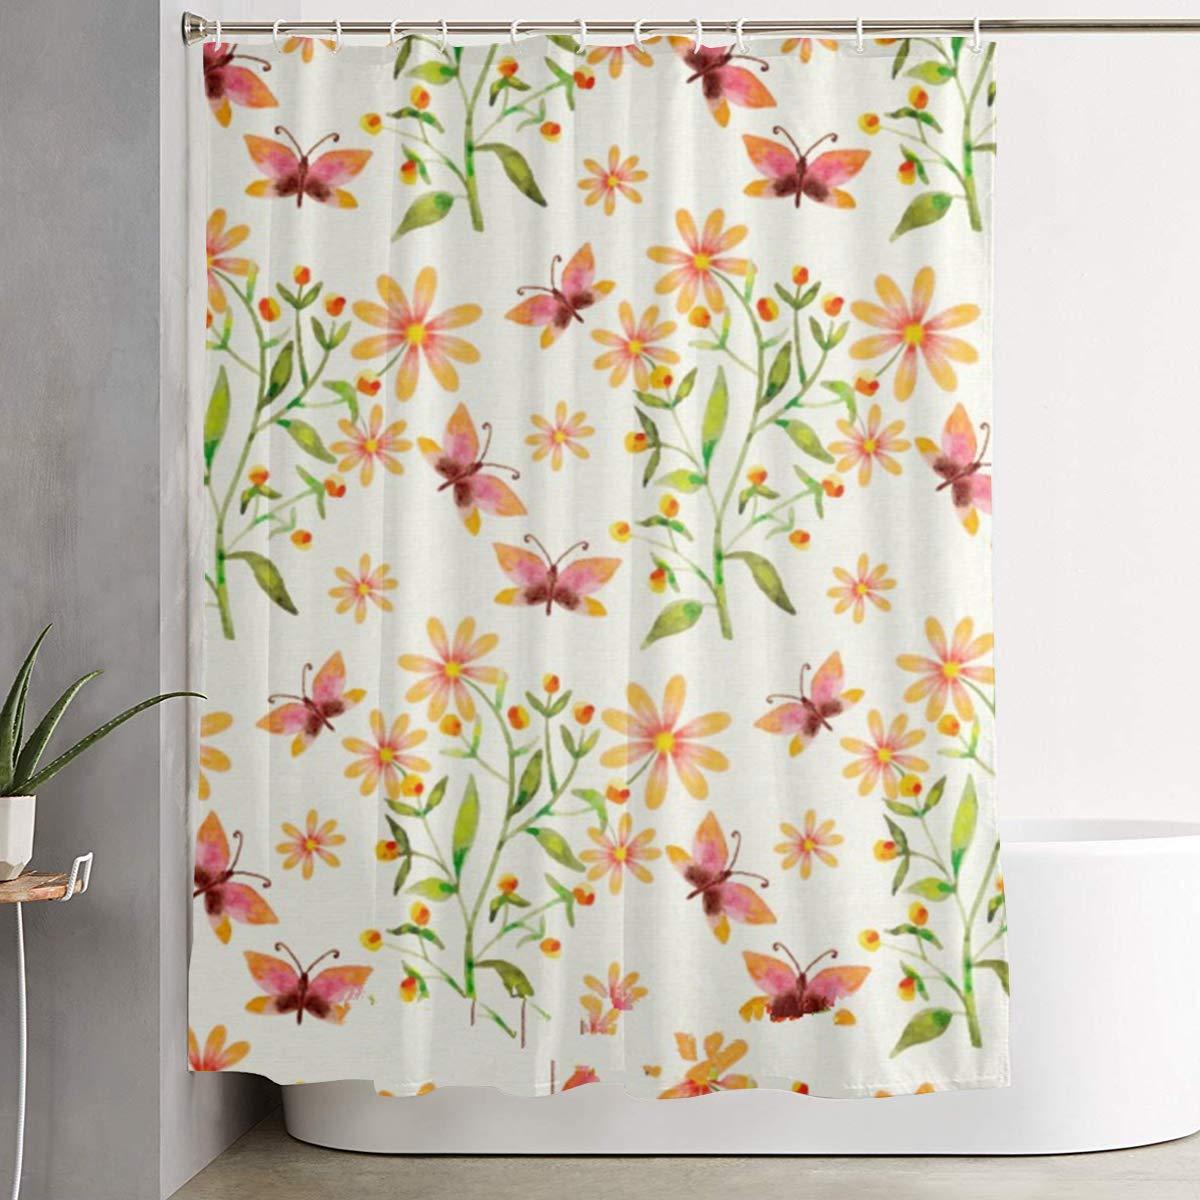 Amazon RF94nu Orange Flowers Mildew Resistant Fabric Waterproof Bathroom Shower Curtain Home Kitchen